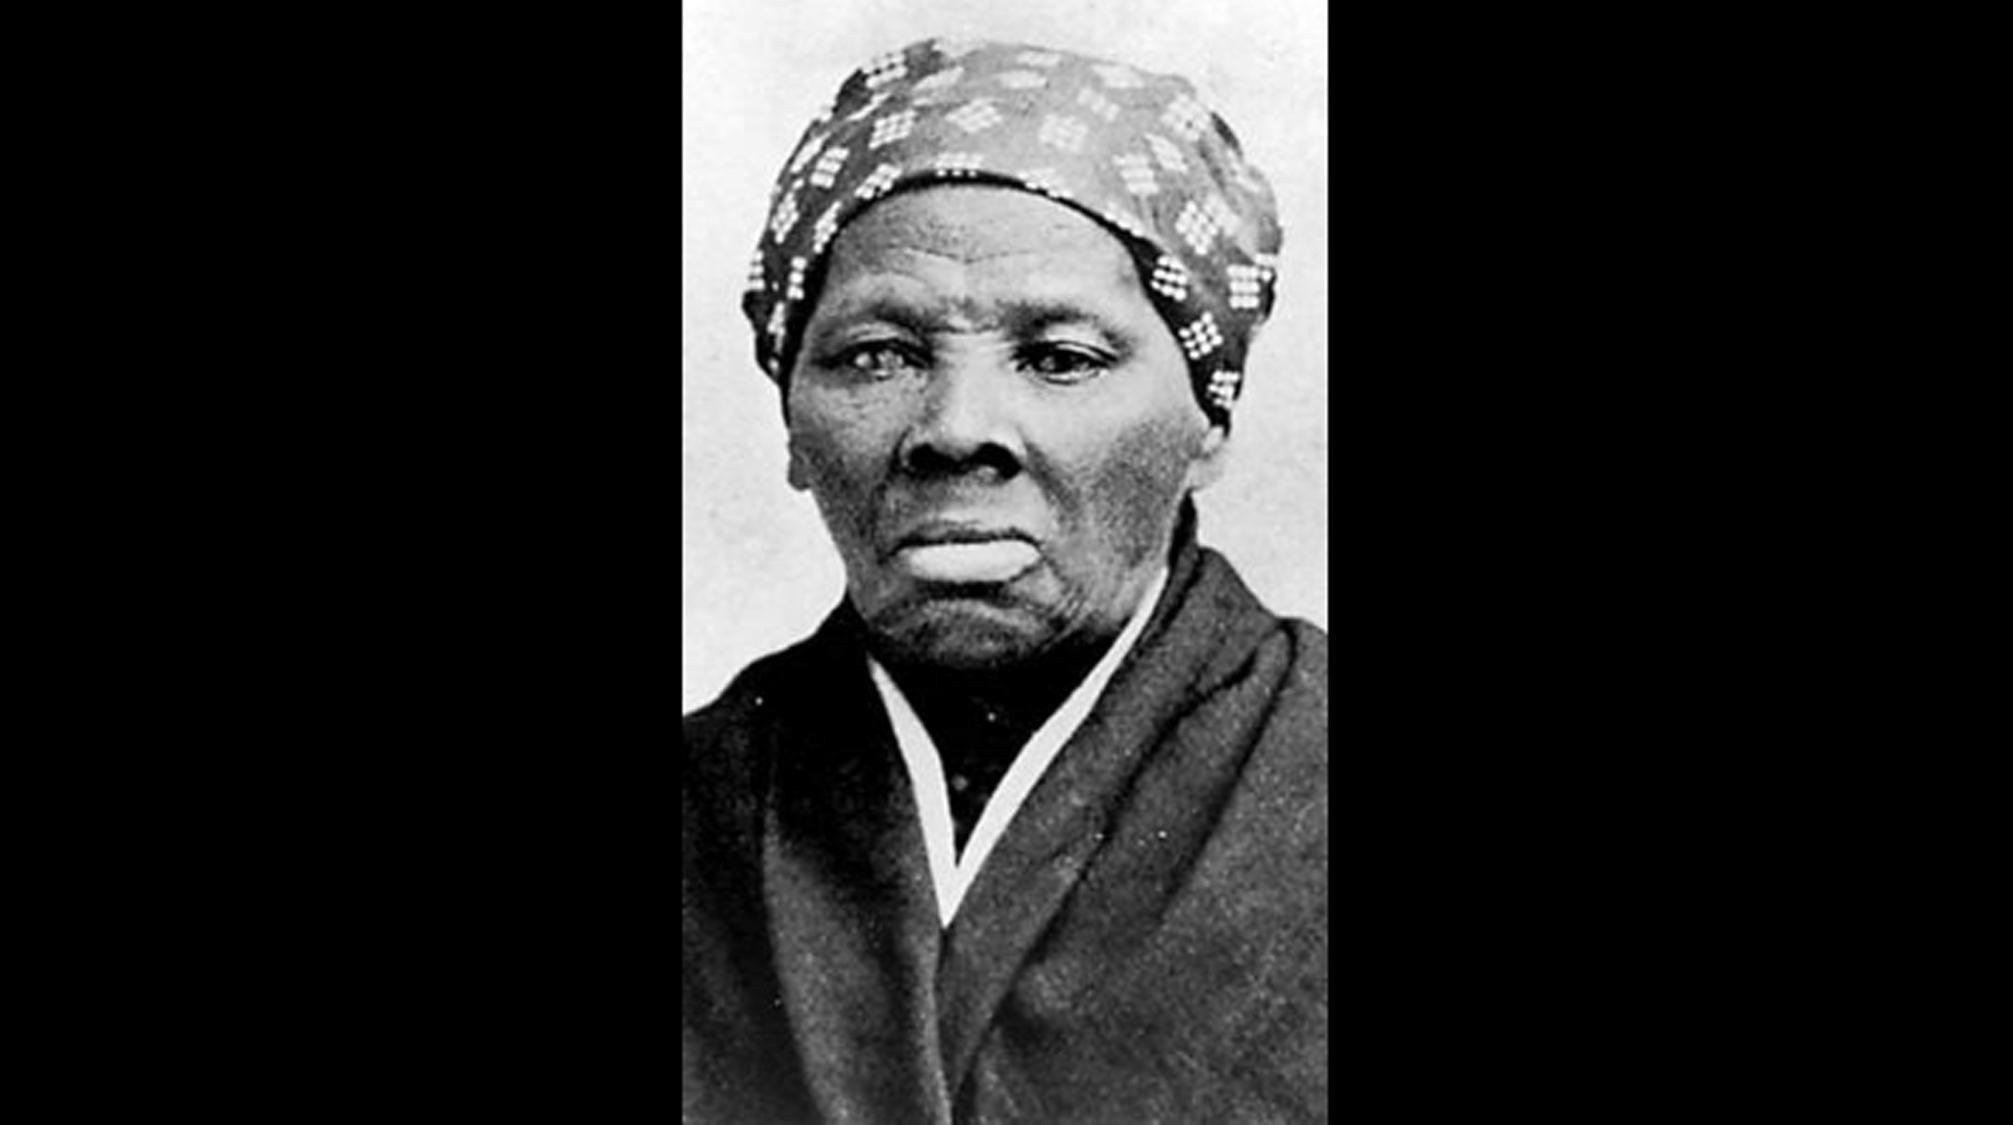 bs-md-tubman-park-20141213 Harriet Tubman Plantation House on anime plantation house, family harriet tubman house, grave harriet tubman house, civil war plantation house, harriet tubman house new york, slavery plantation house,